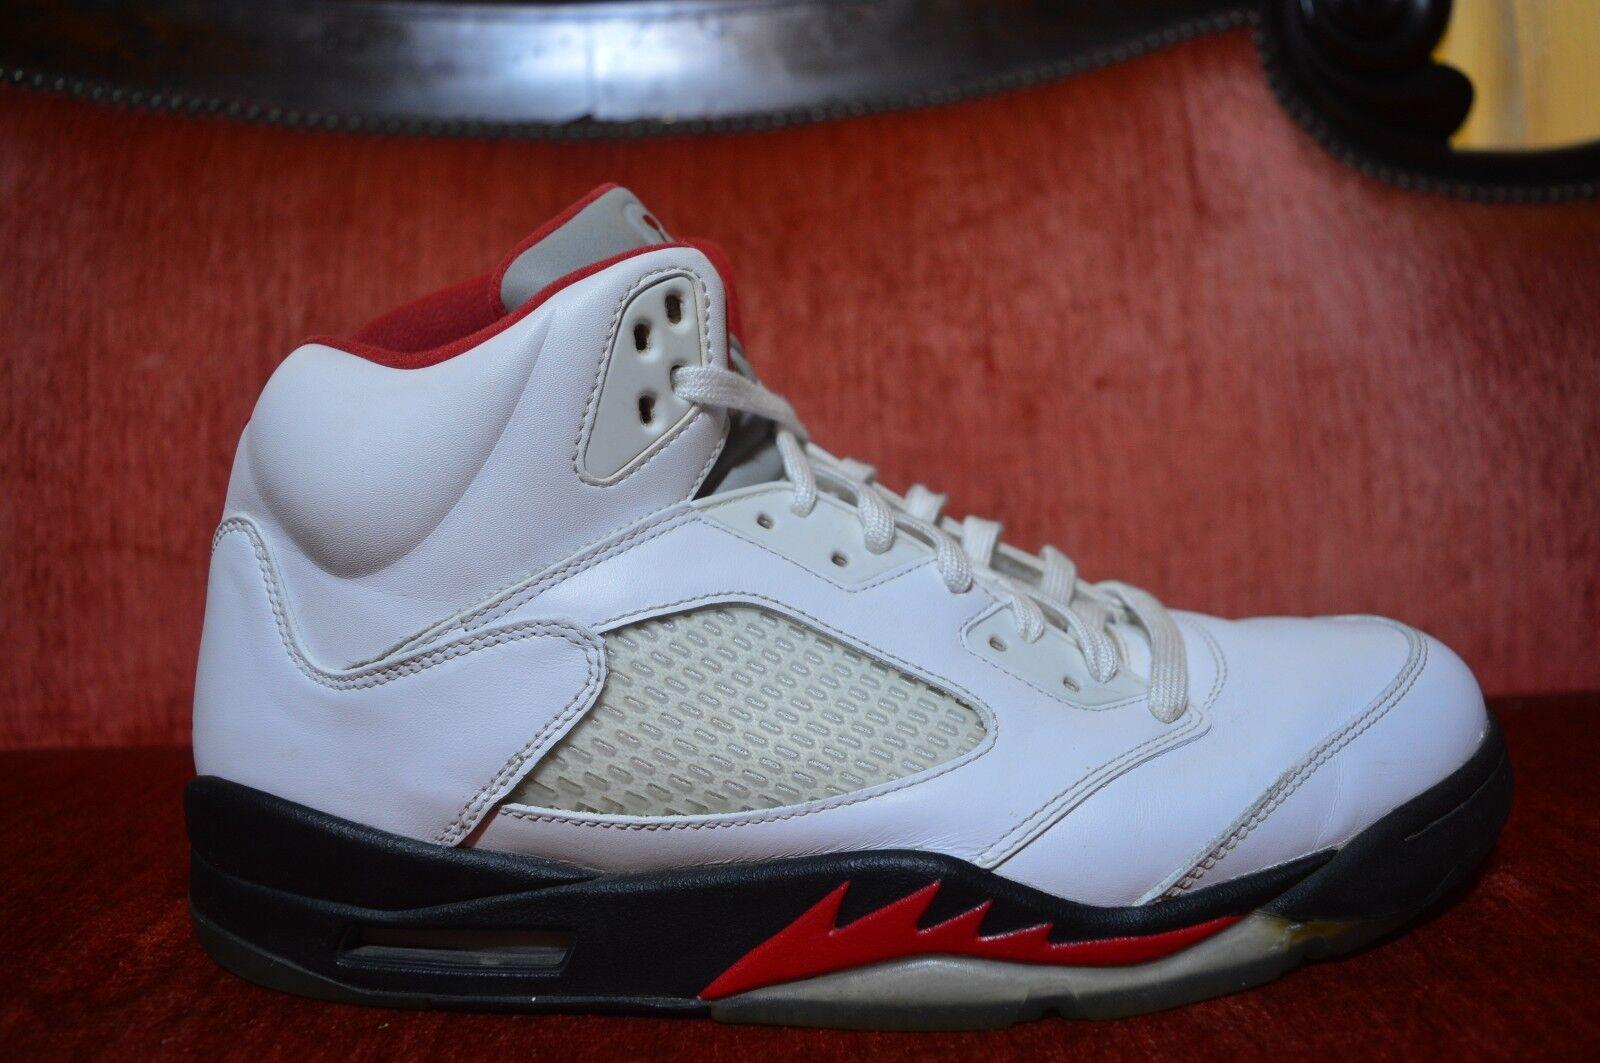 RARE Nike Air Jordan 5 V Retro White Fire Red Black Wolf Gray Comfortable best-selling model of the brand